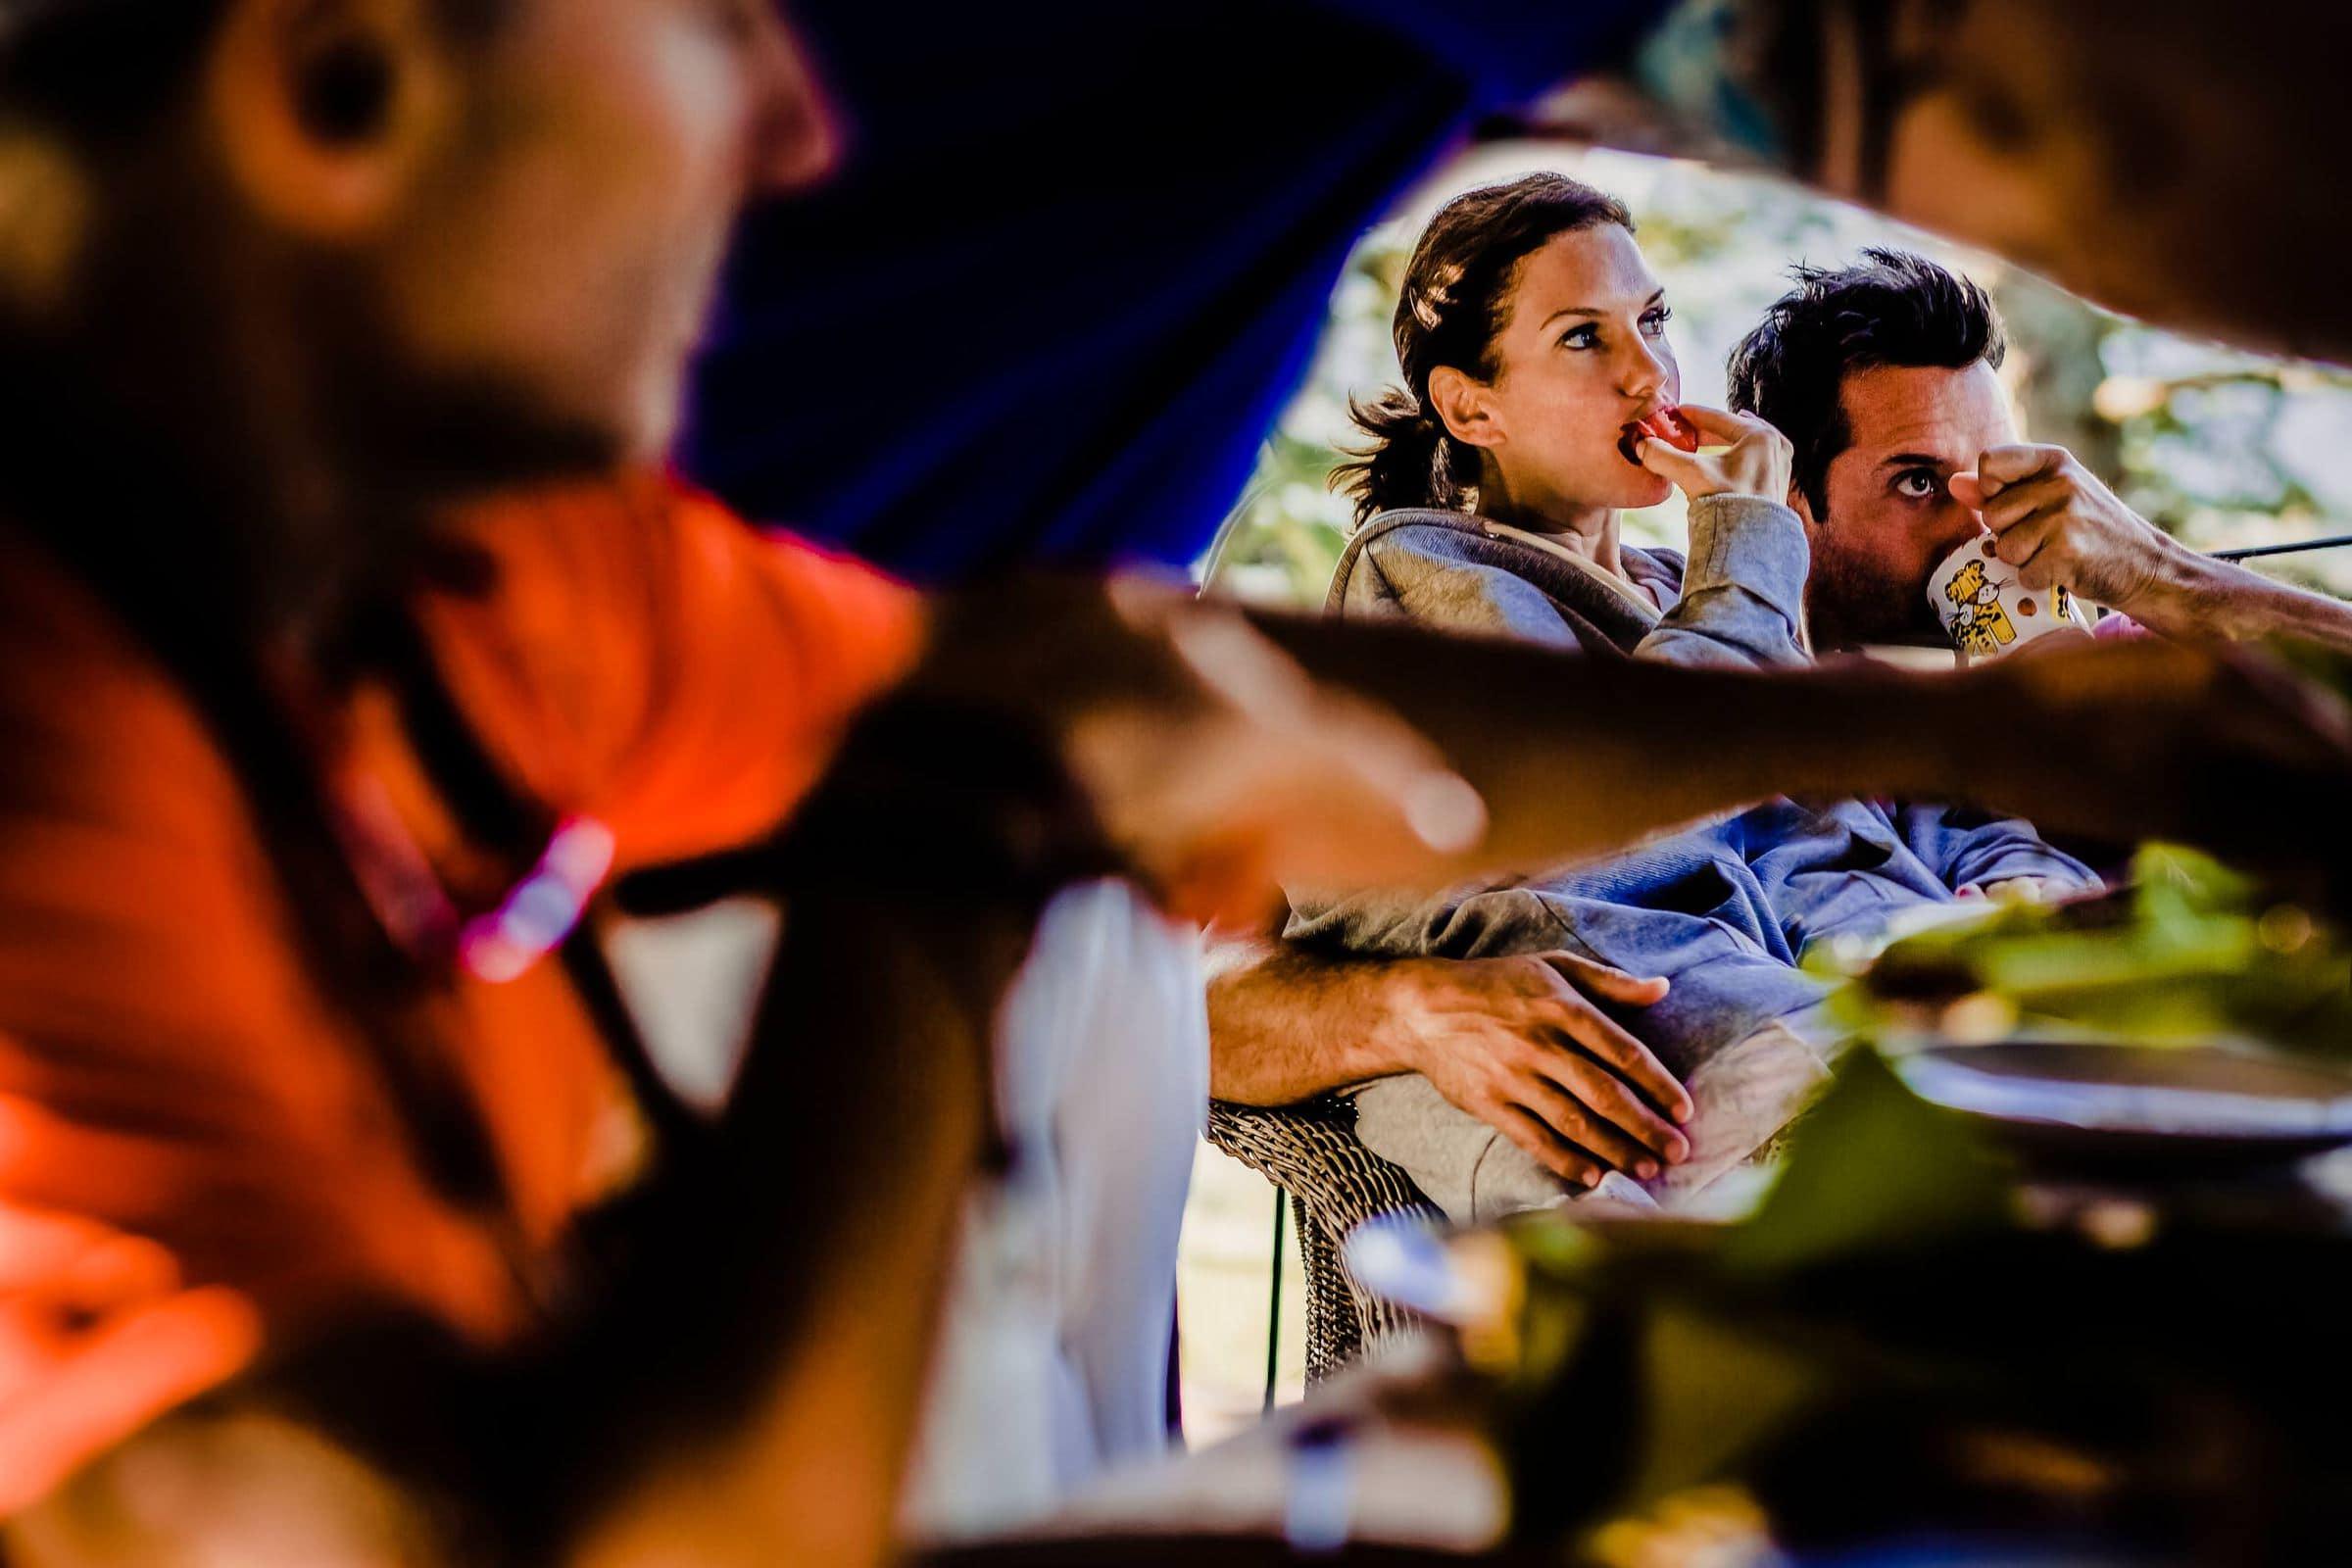 Bride and groom enjoying breakfast at their Villa Tre Grazie wedding celebration near Todi, Italy.